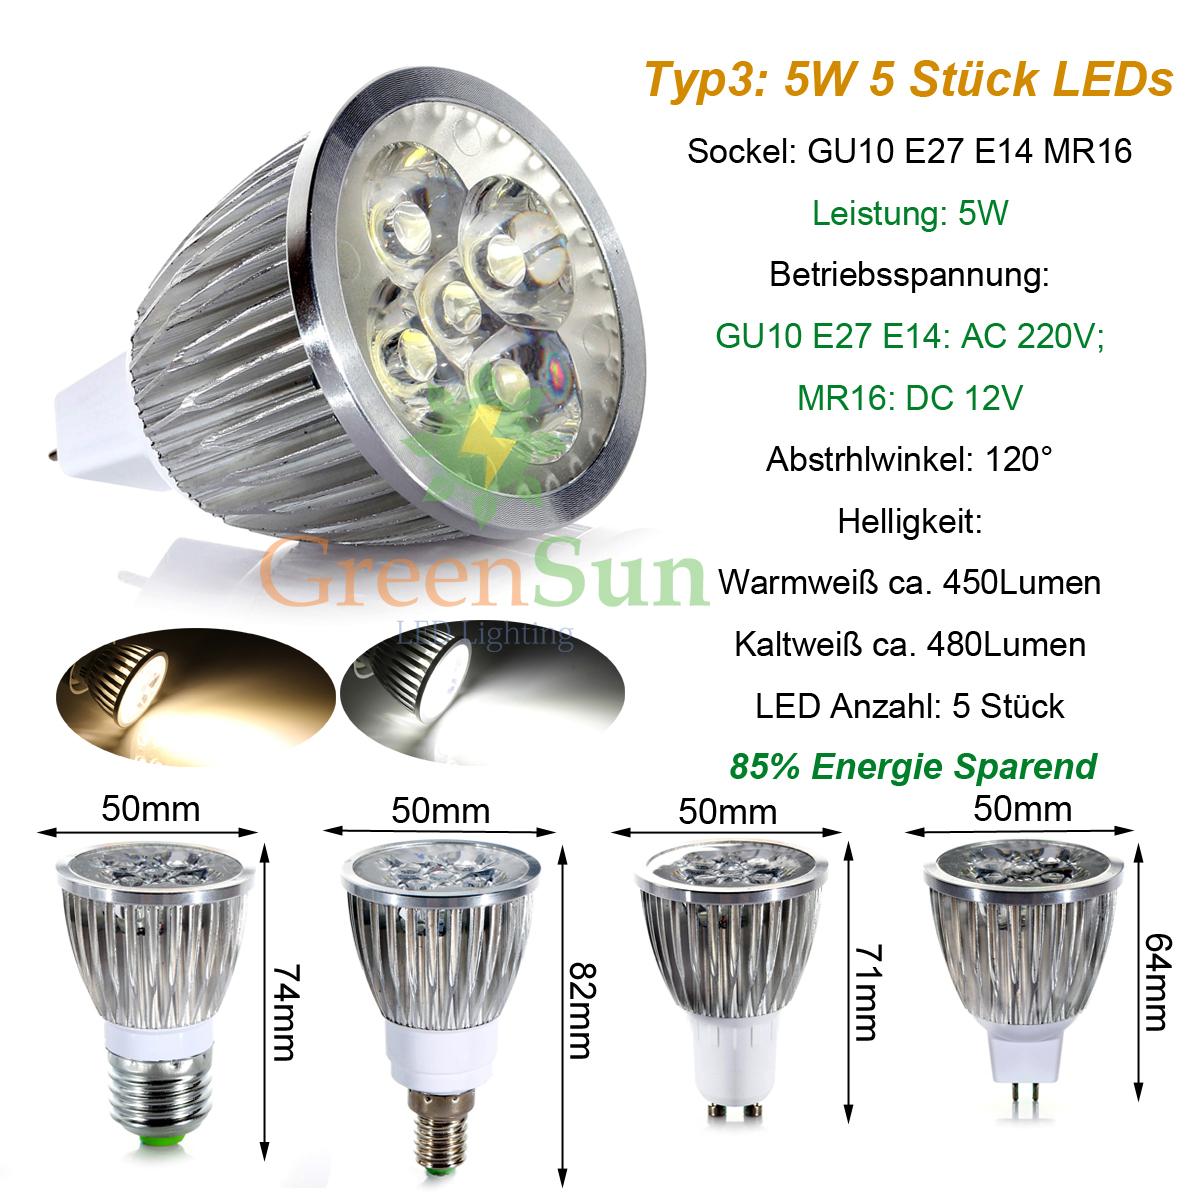 3w 5w led e14 gu10 e27 spot strahler warmwei kaltwei sparlampe leuchtmittel ebay. Black Bedroom Furniture Sets. Home Design Ideas